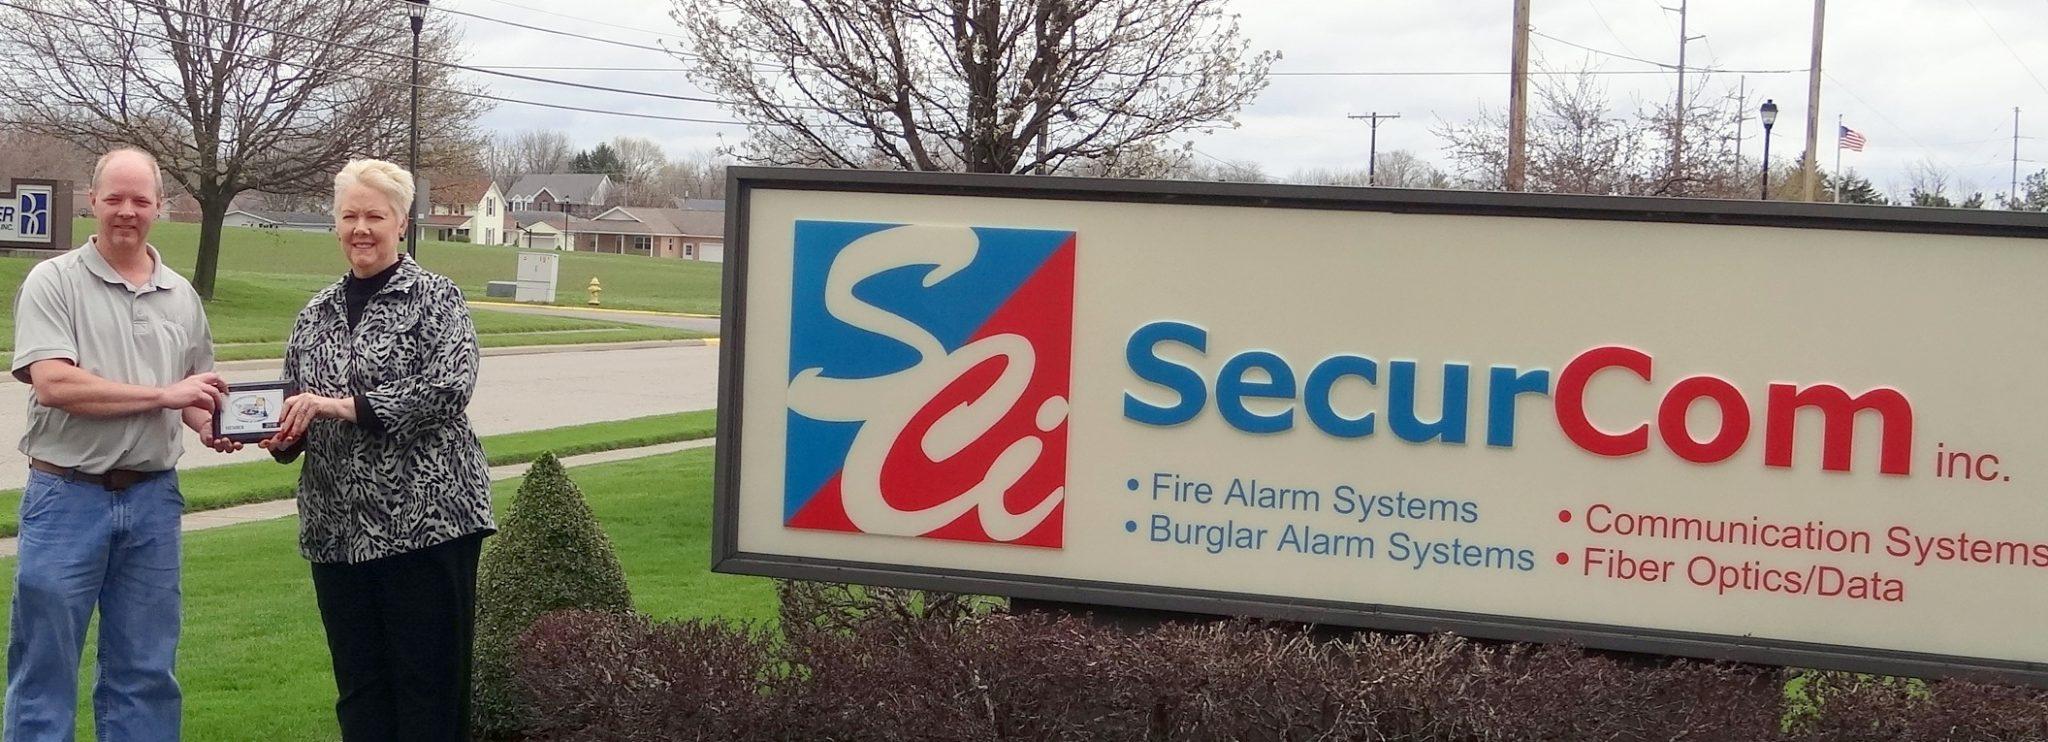 SecurCom Joins Chamber